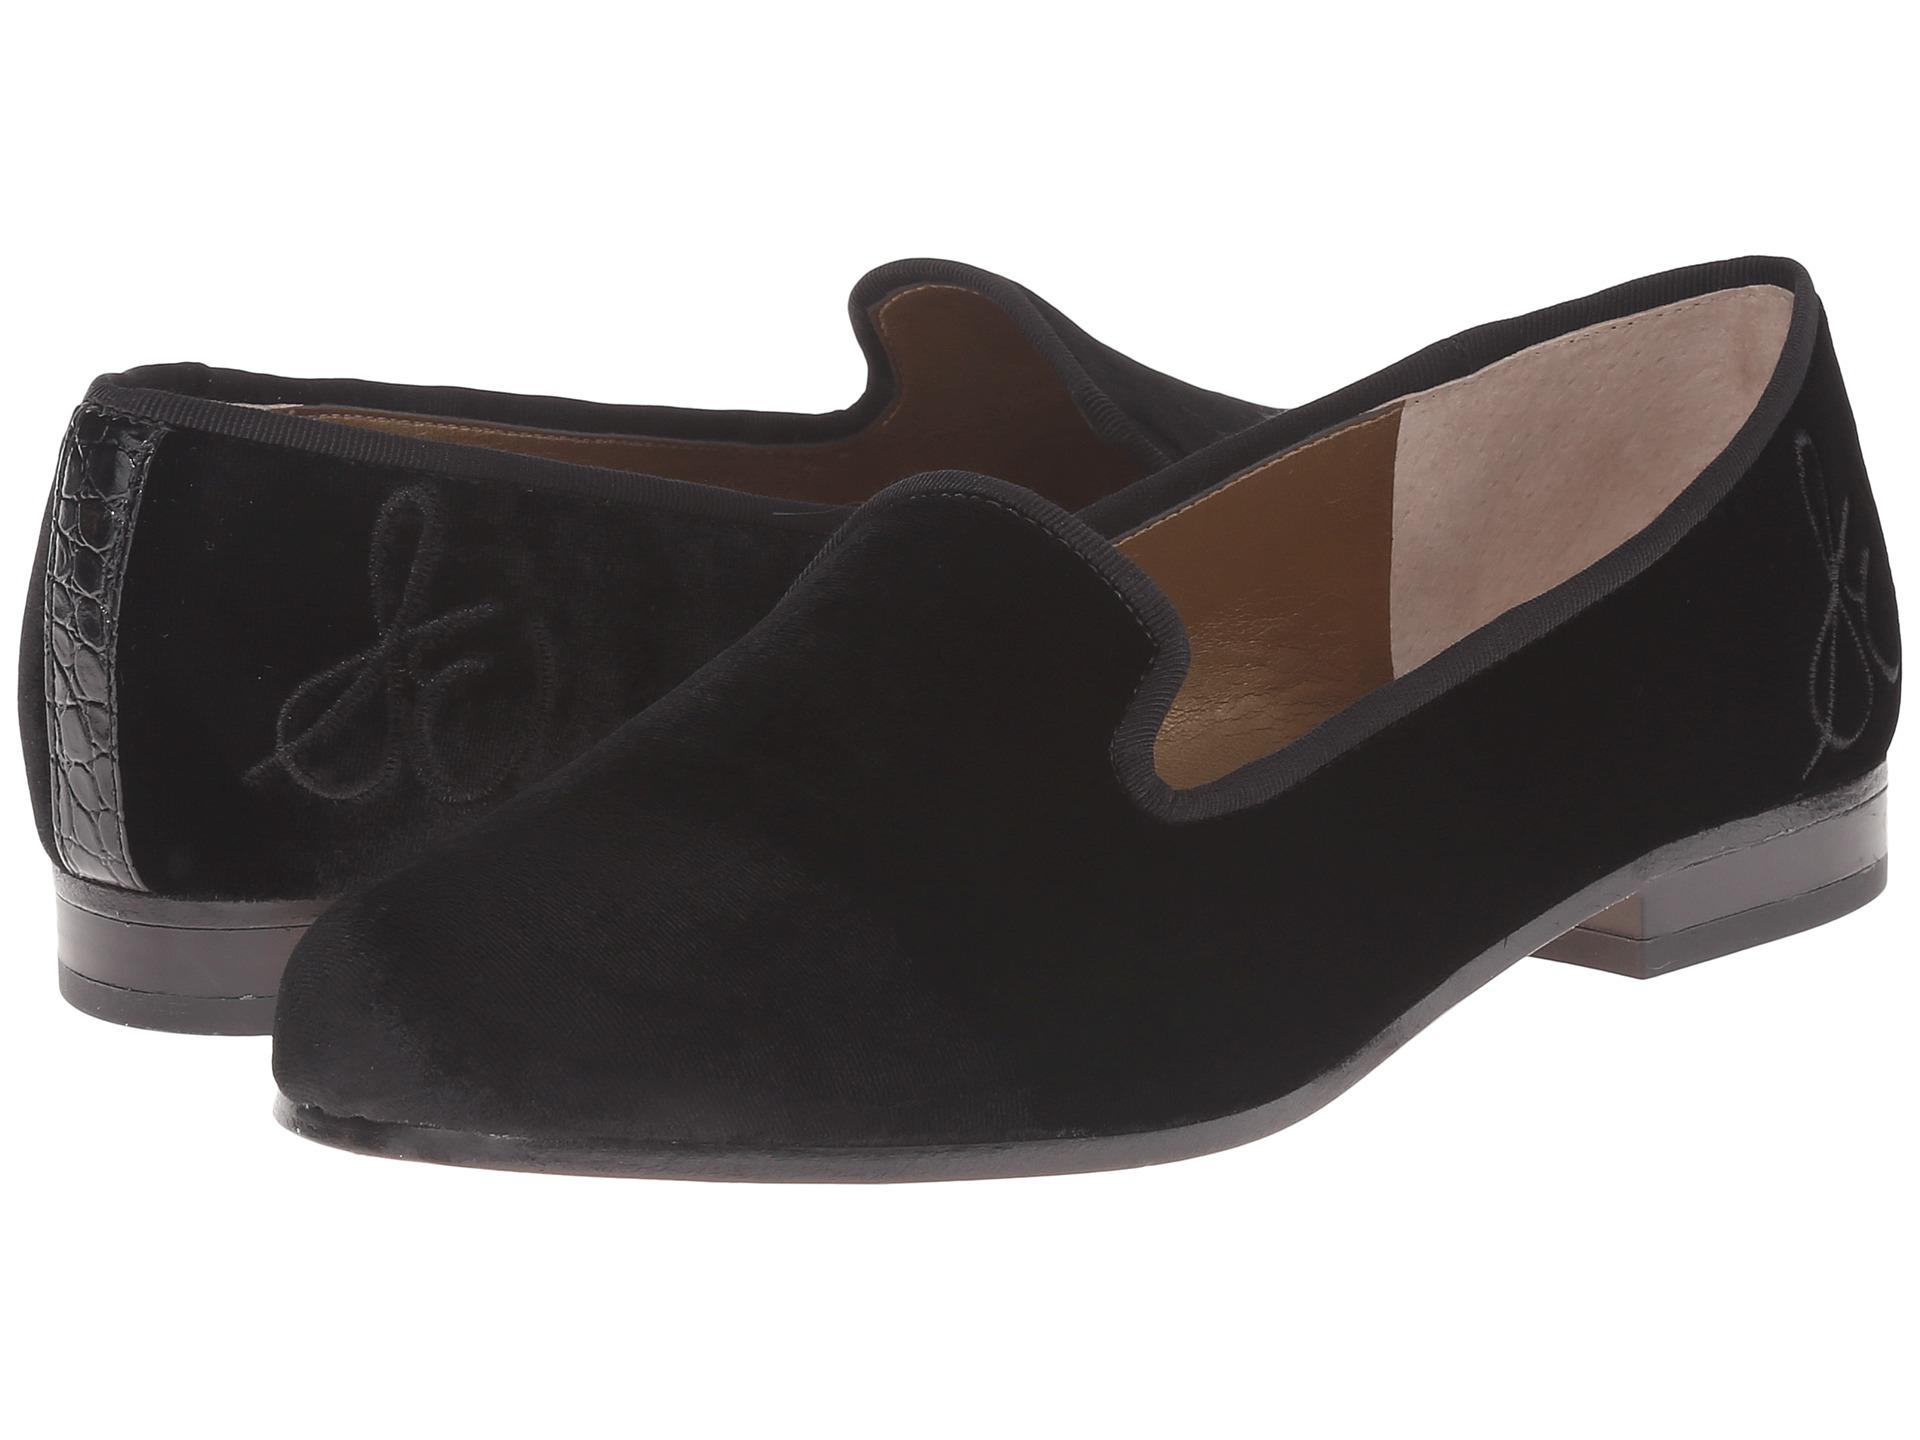 Womens Shoes Sam Edelman Hurlie Black Kid Suede